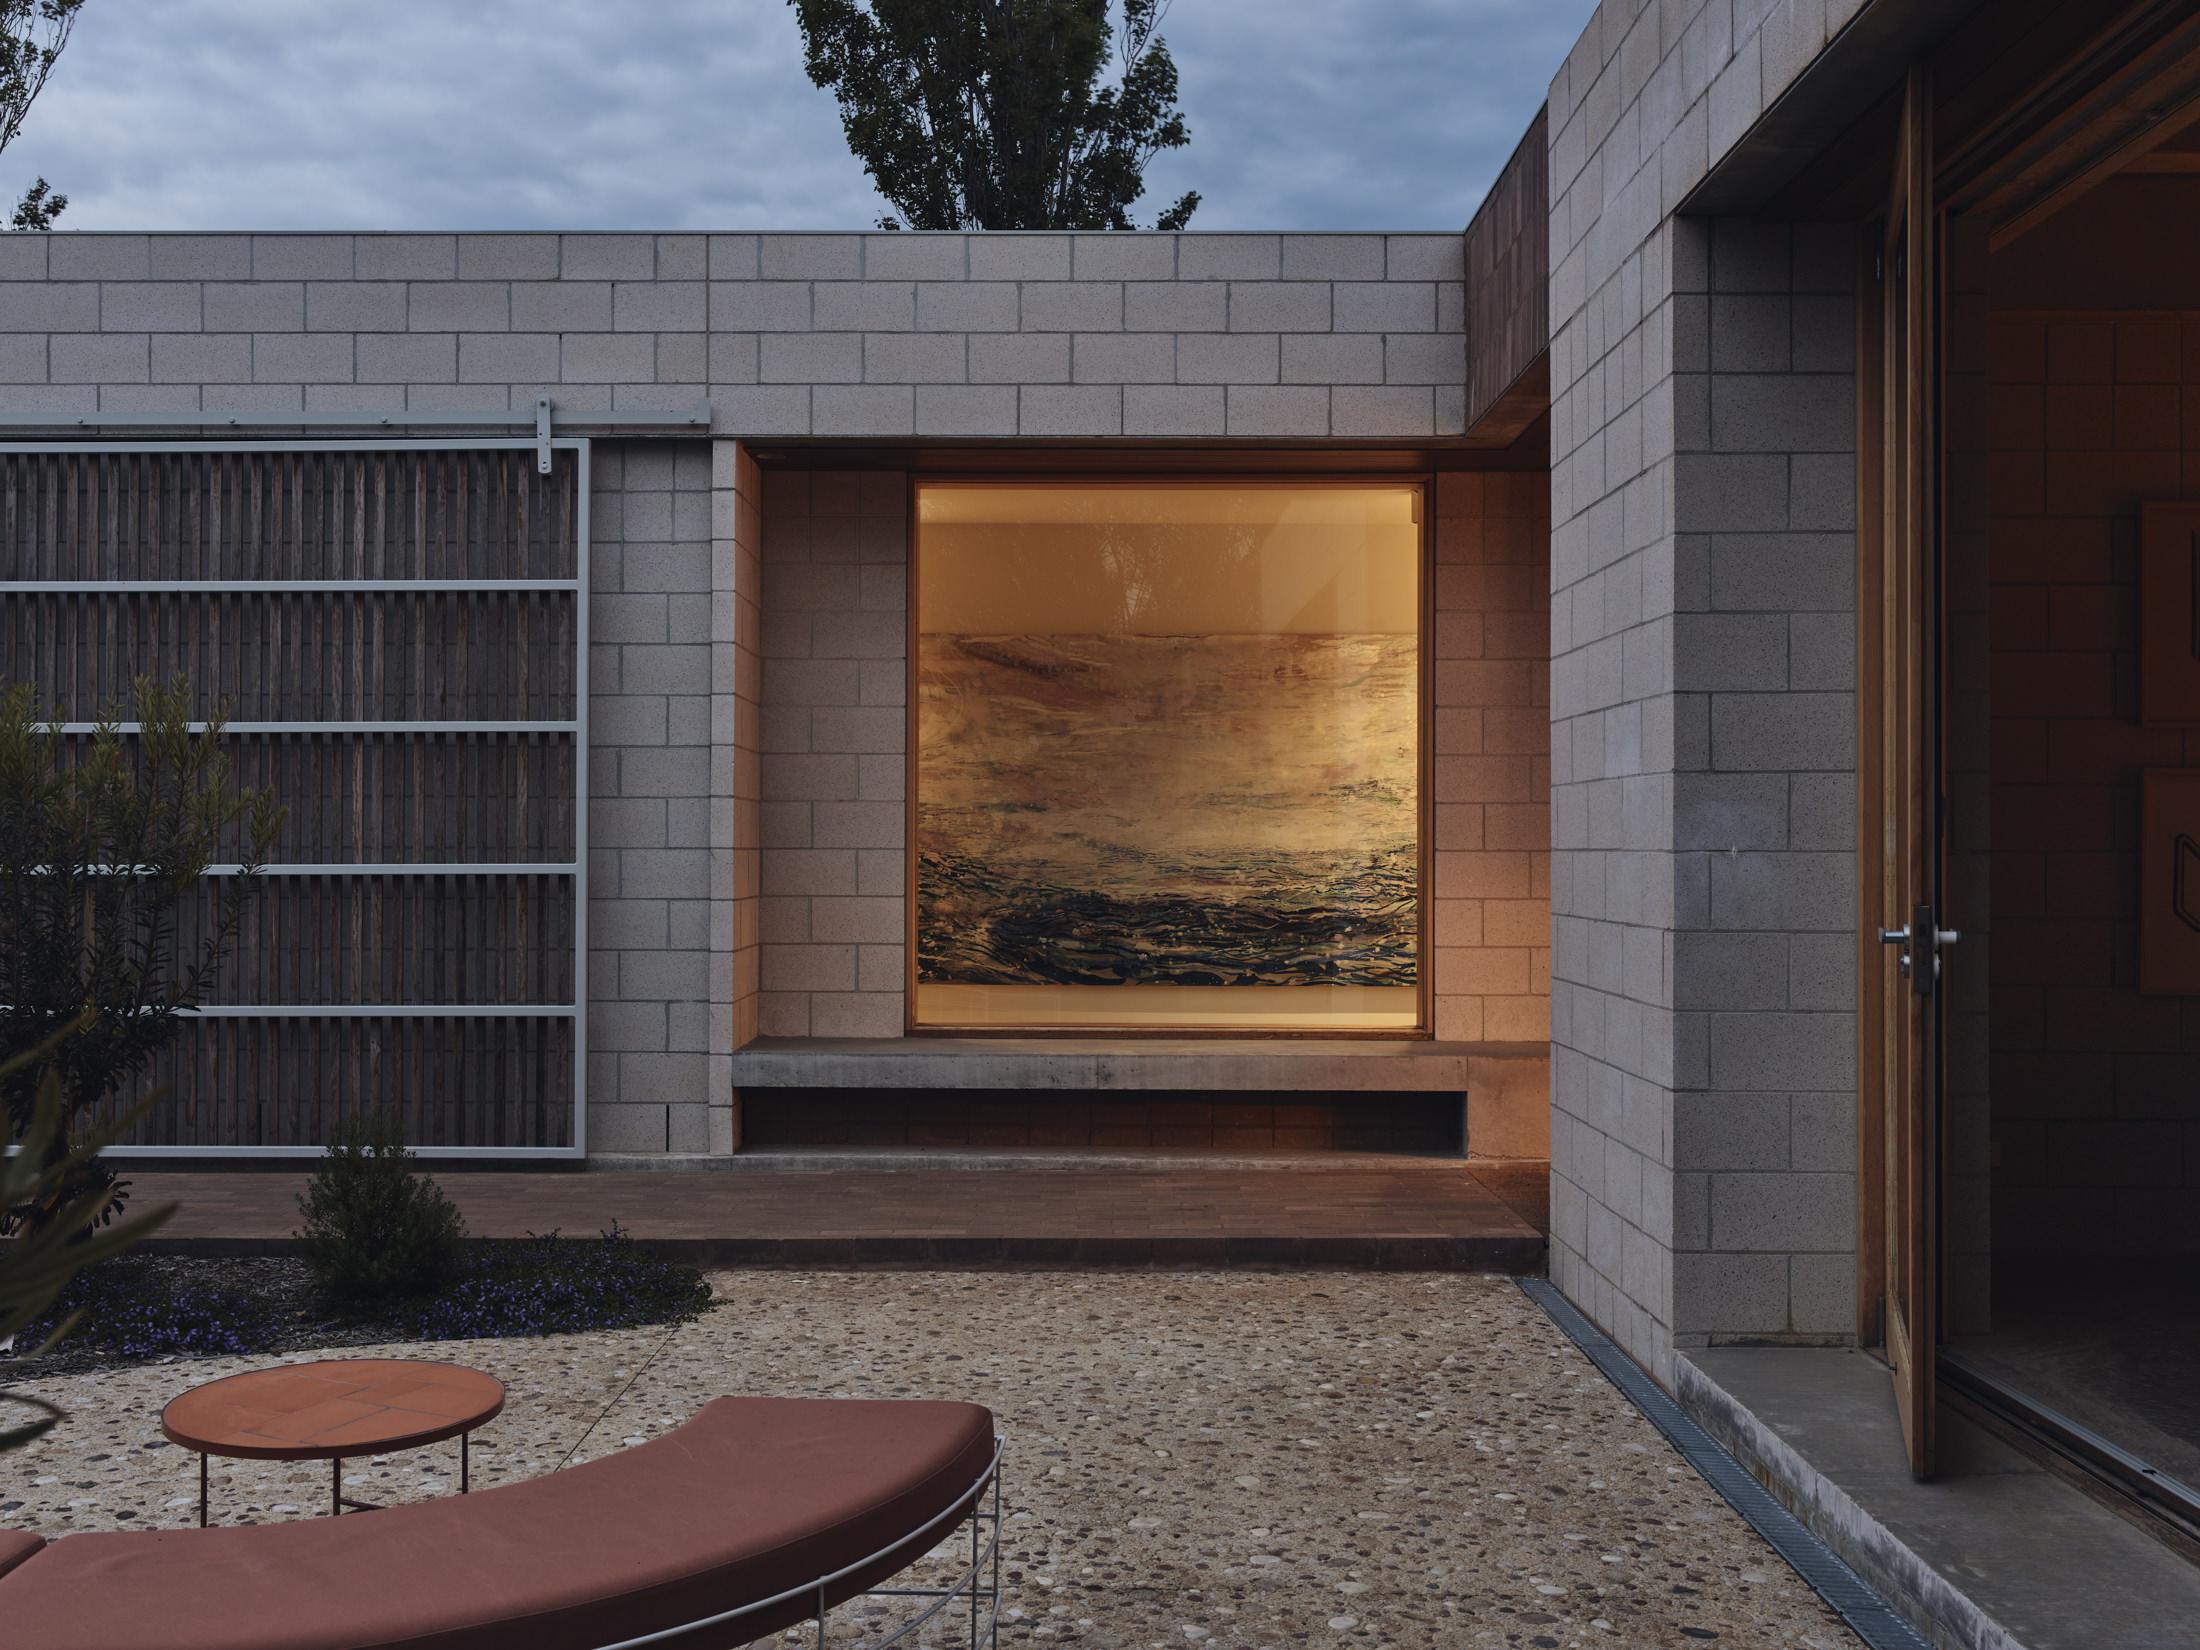 Architects Eat Bellows Beach House Flinders Masonry Architecture Photo Derek Swalwell Yellowtrace 61